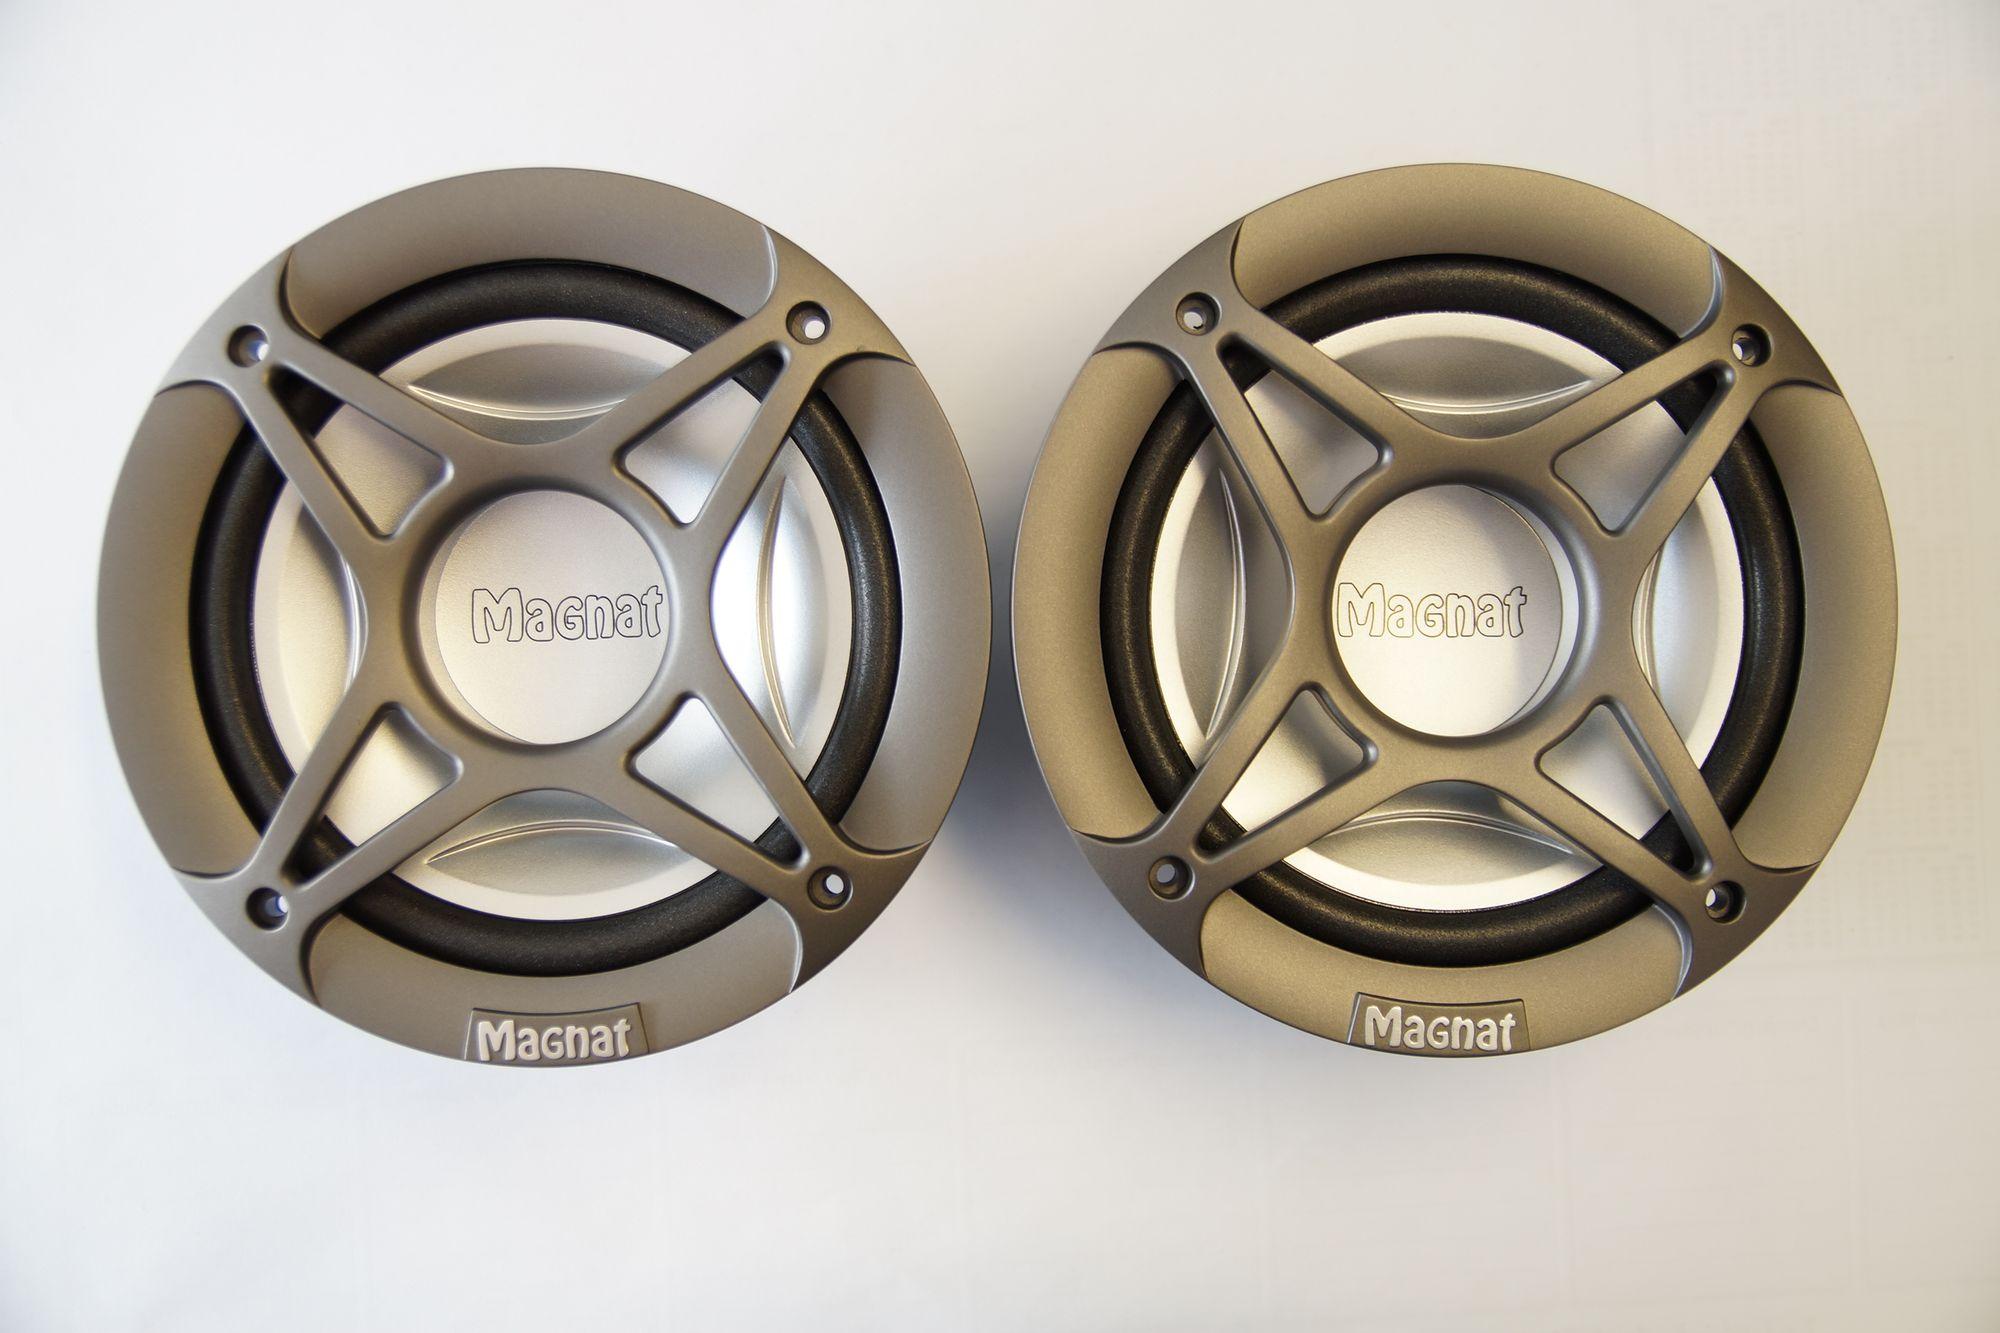 1 Paar Magnat Power Plus 2.16 Subwoofer Kickbass Tieftöner NEU